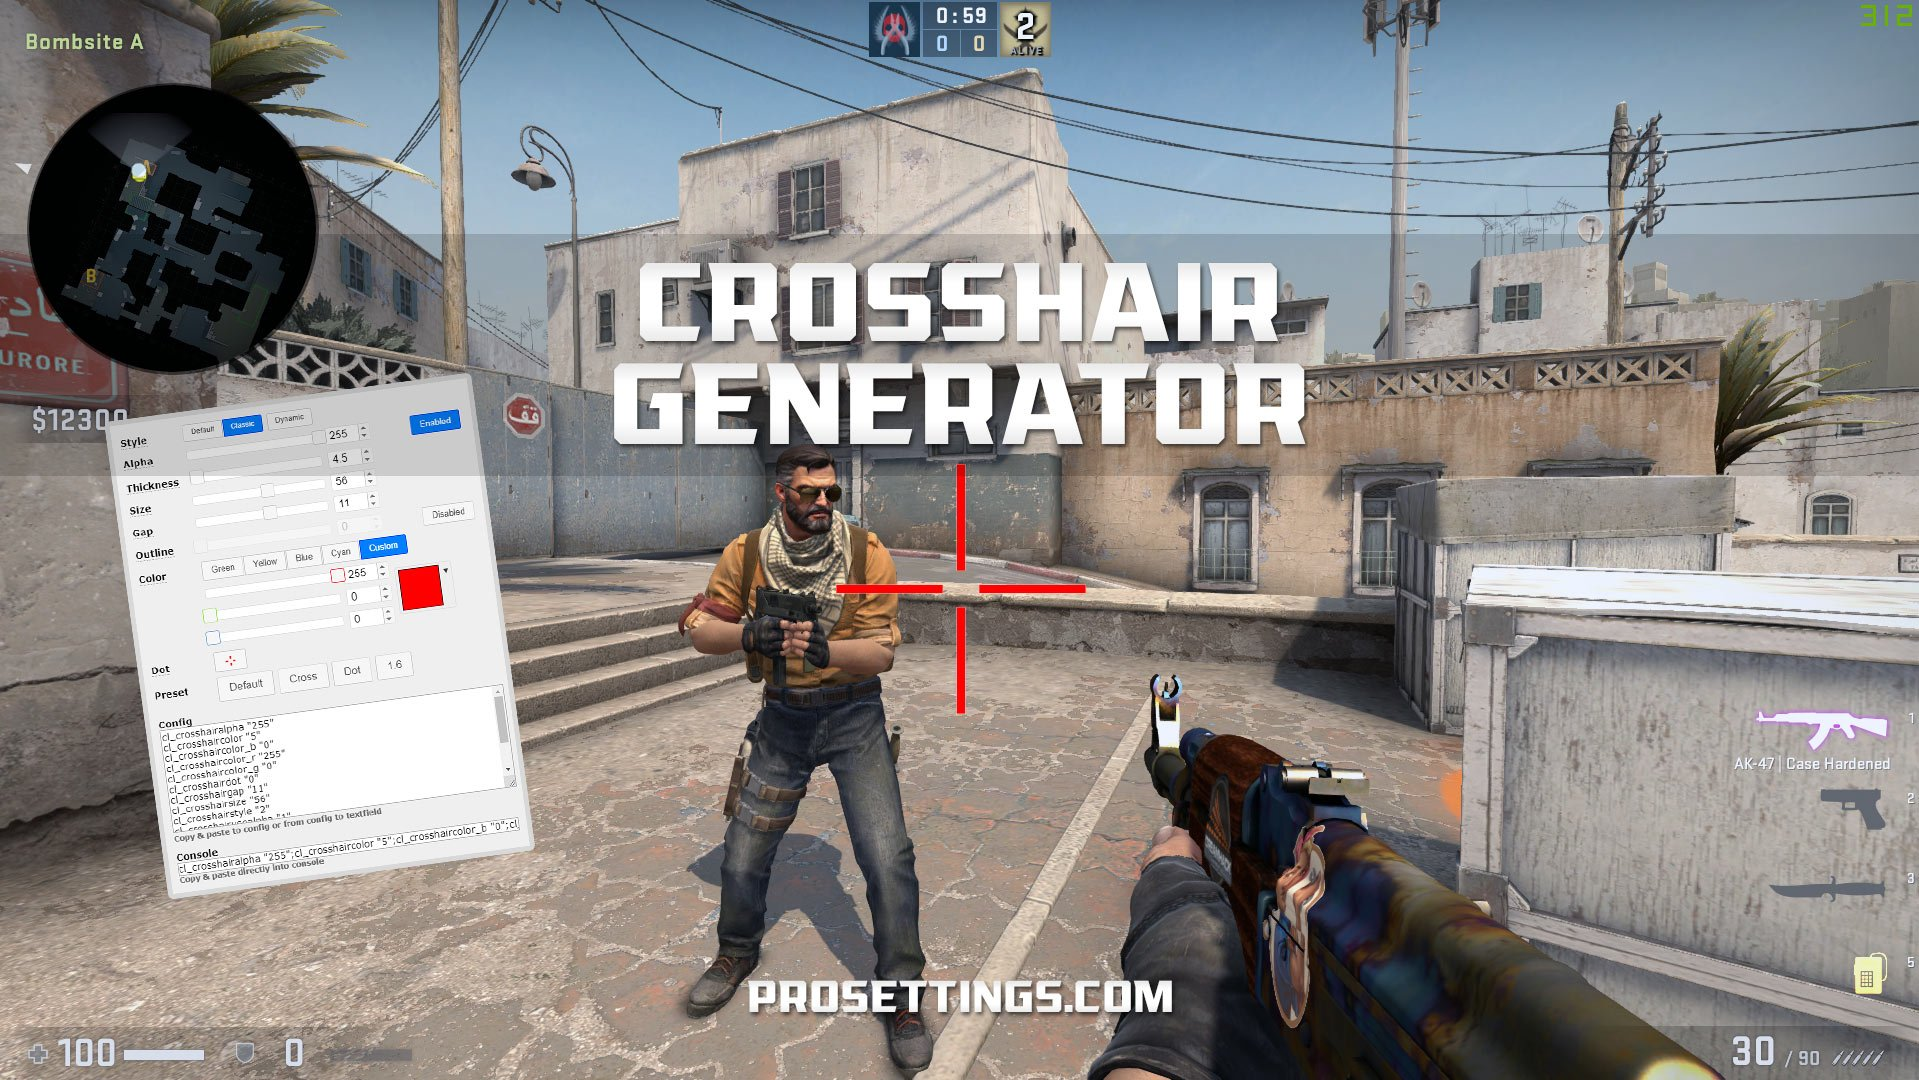 Crosshair Generator for CS:GO - ProSettings Pro Tools